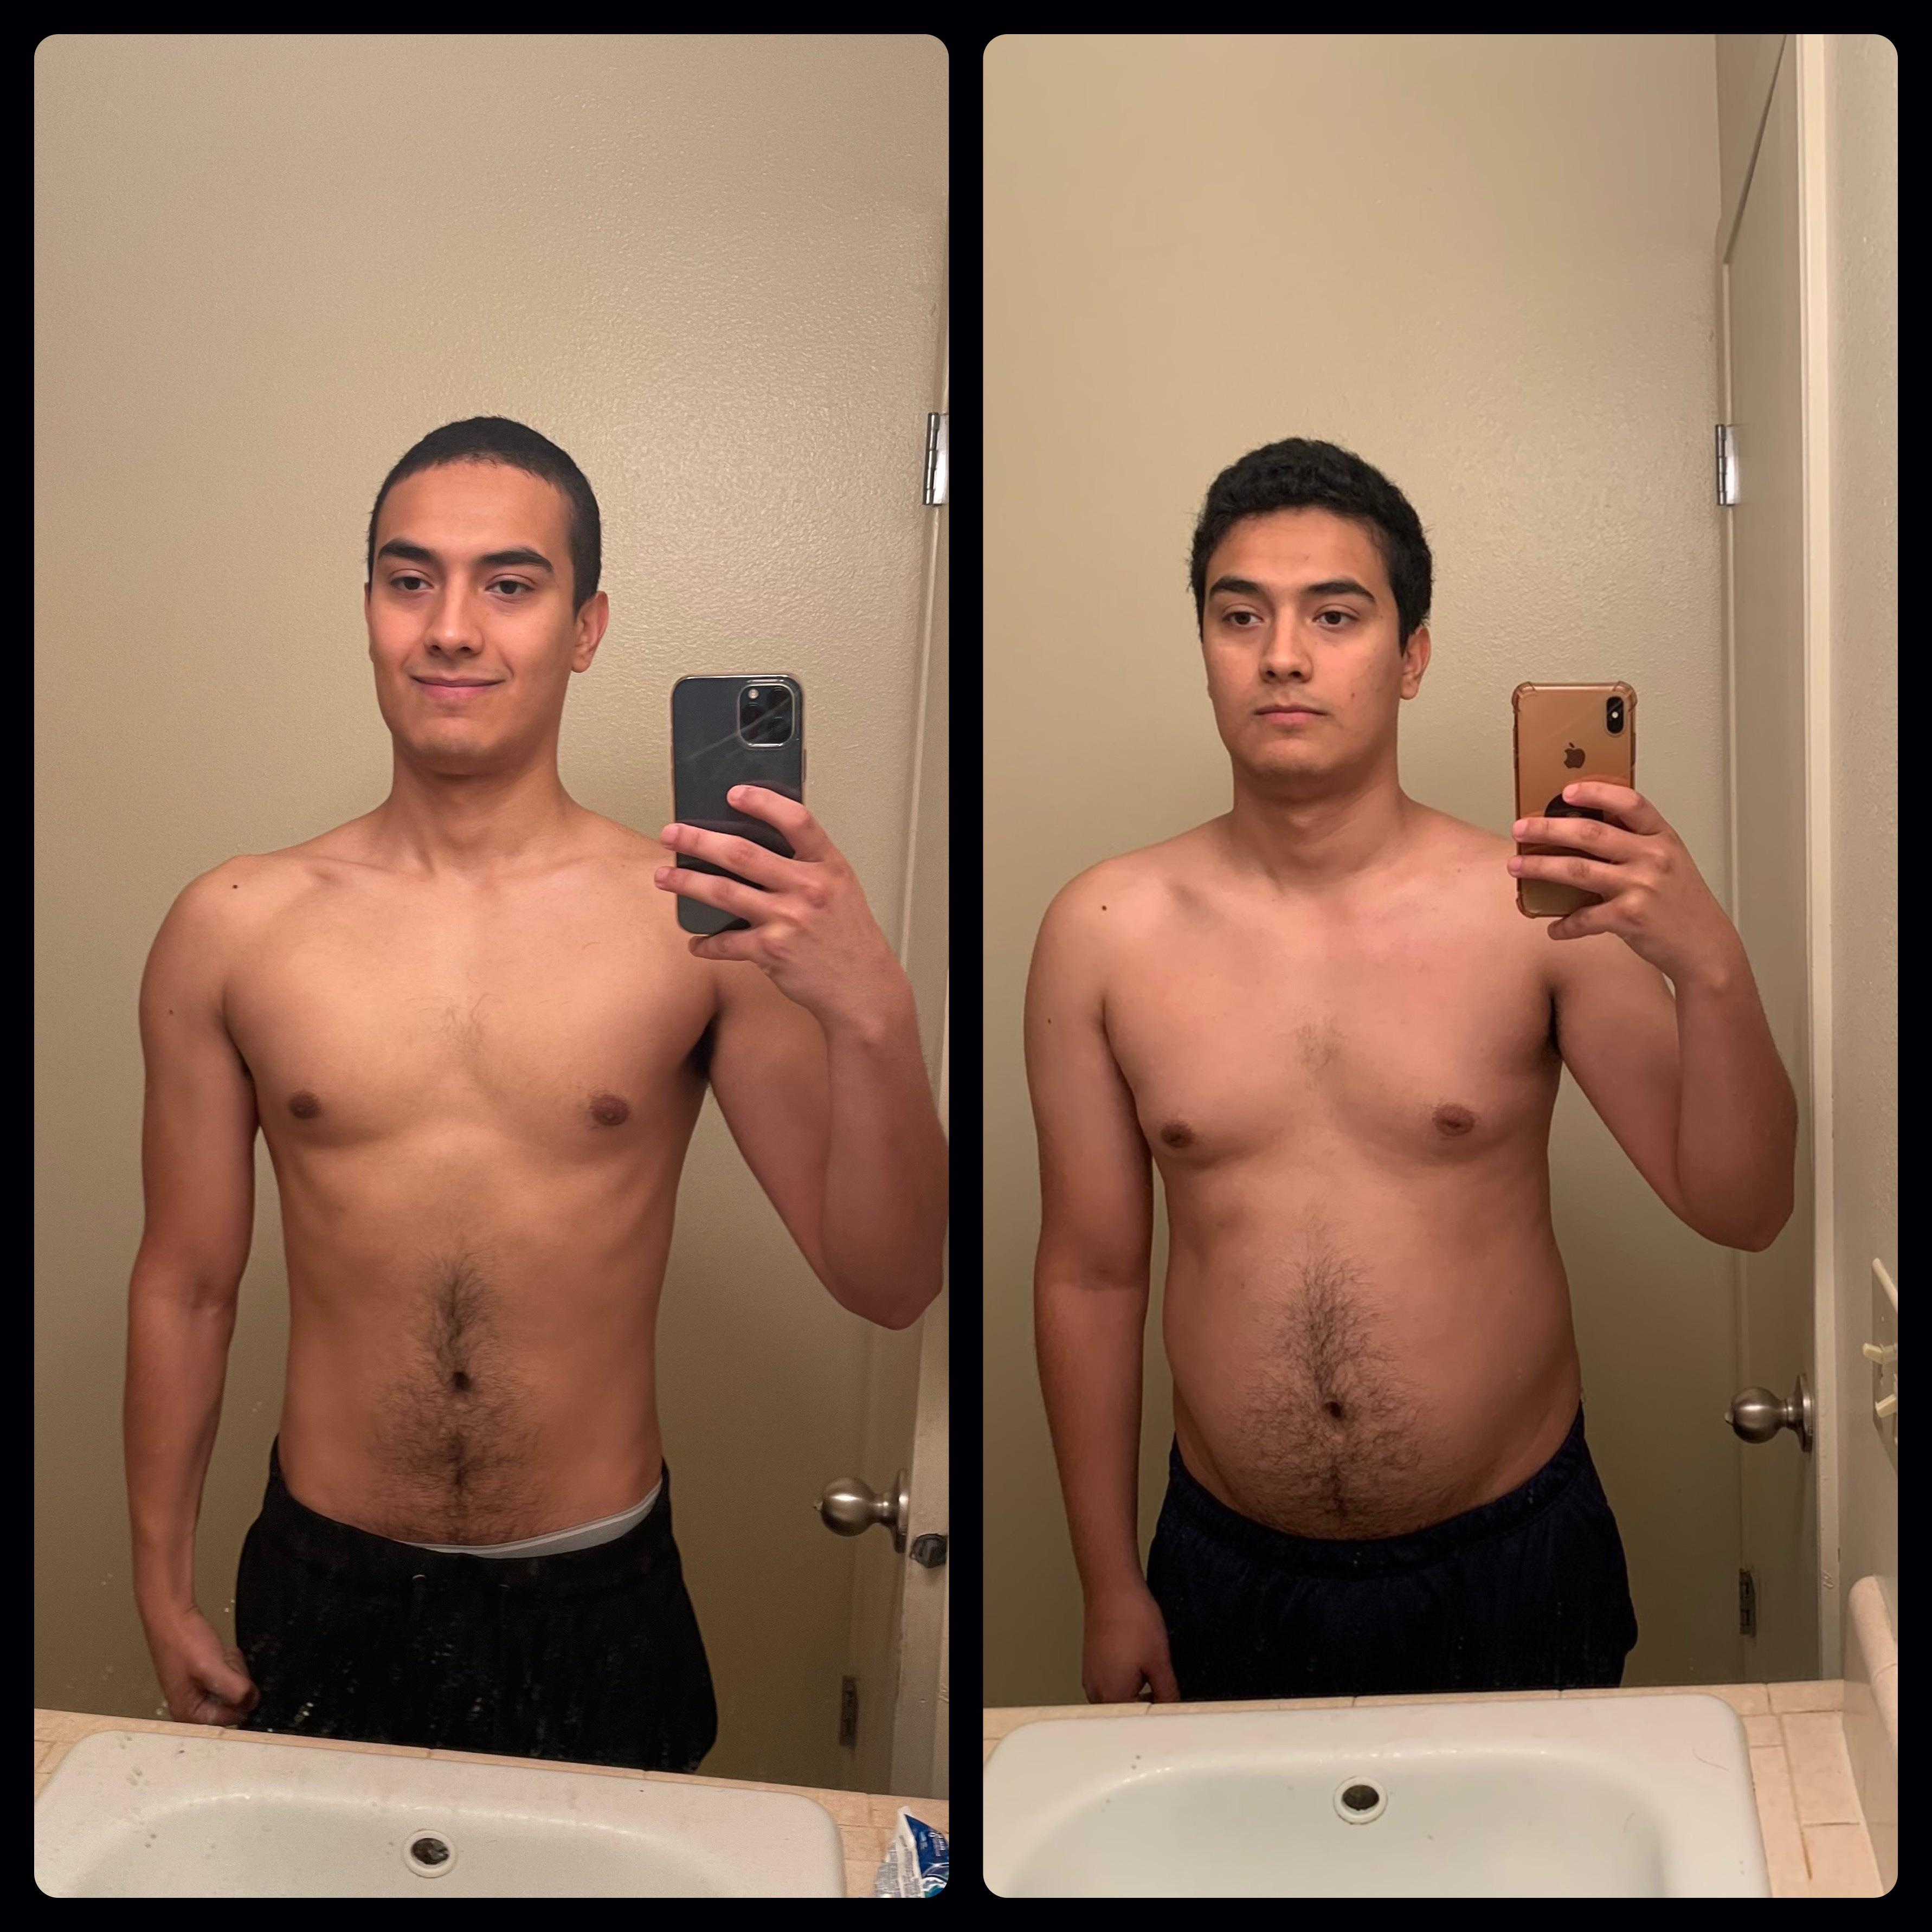 5 foot 10 Male Progress Pics of 20 lbs Weight Loss 185 lbs to 165 lbs